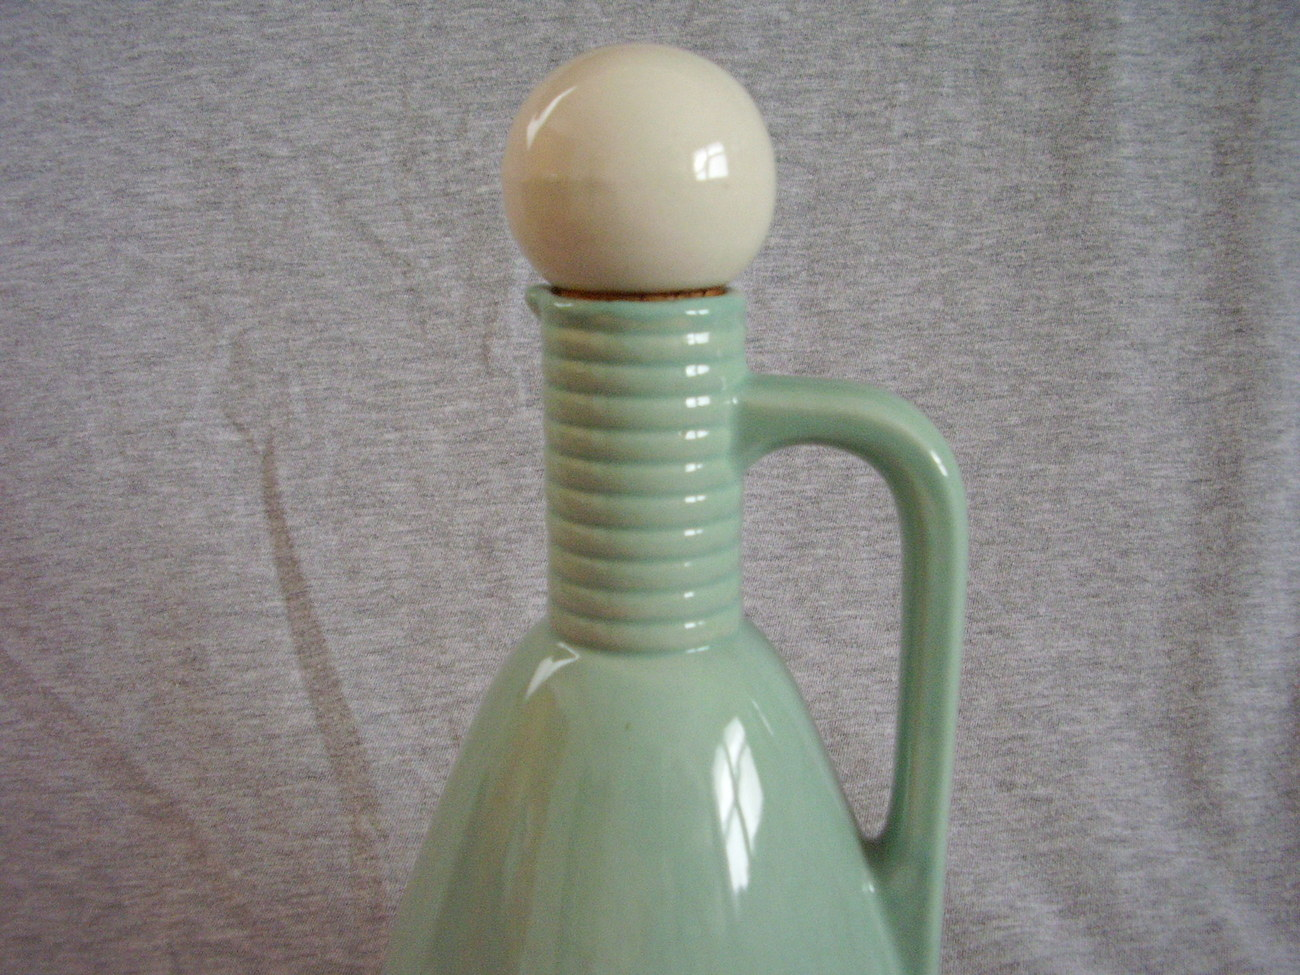 Vintage Handled Cruet Jug Blue Green White Ball Stopper Ring